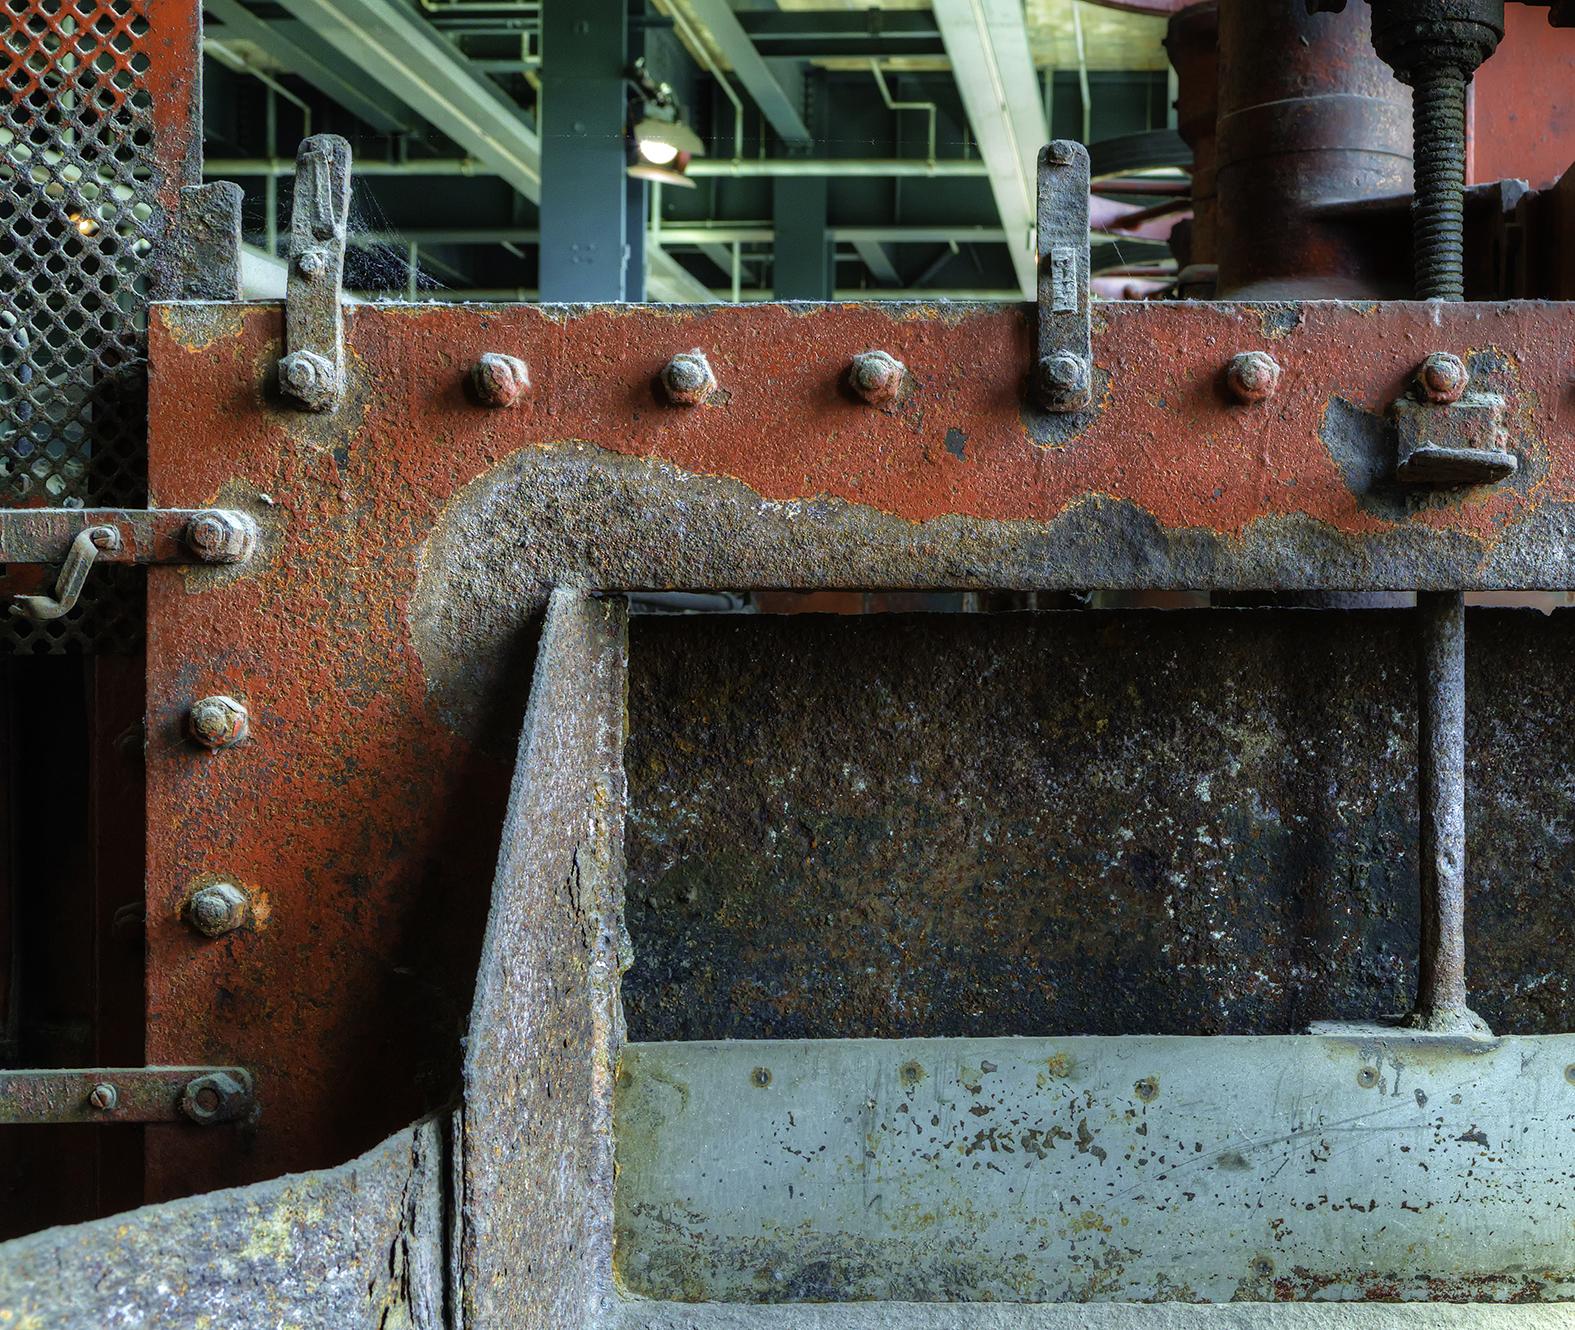 Zeche Zollverein Essen image